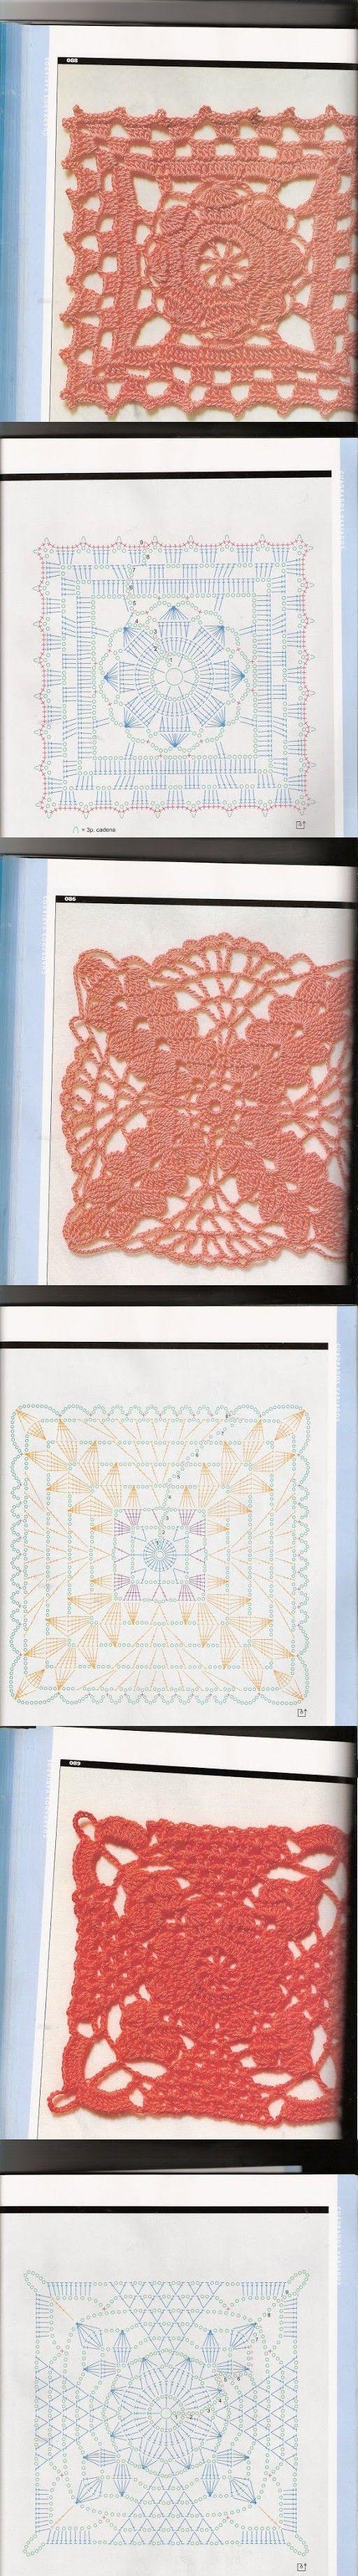 pretty crochet squares